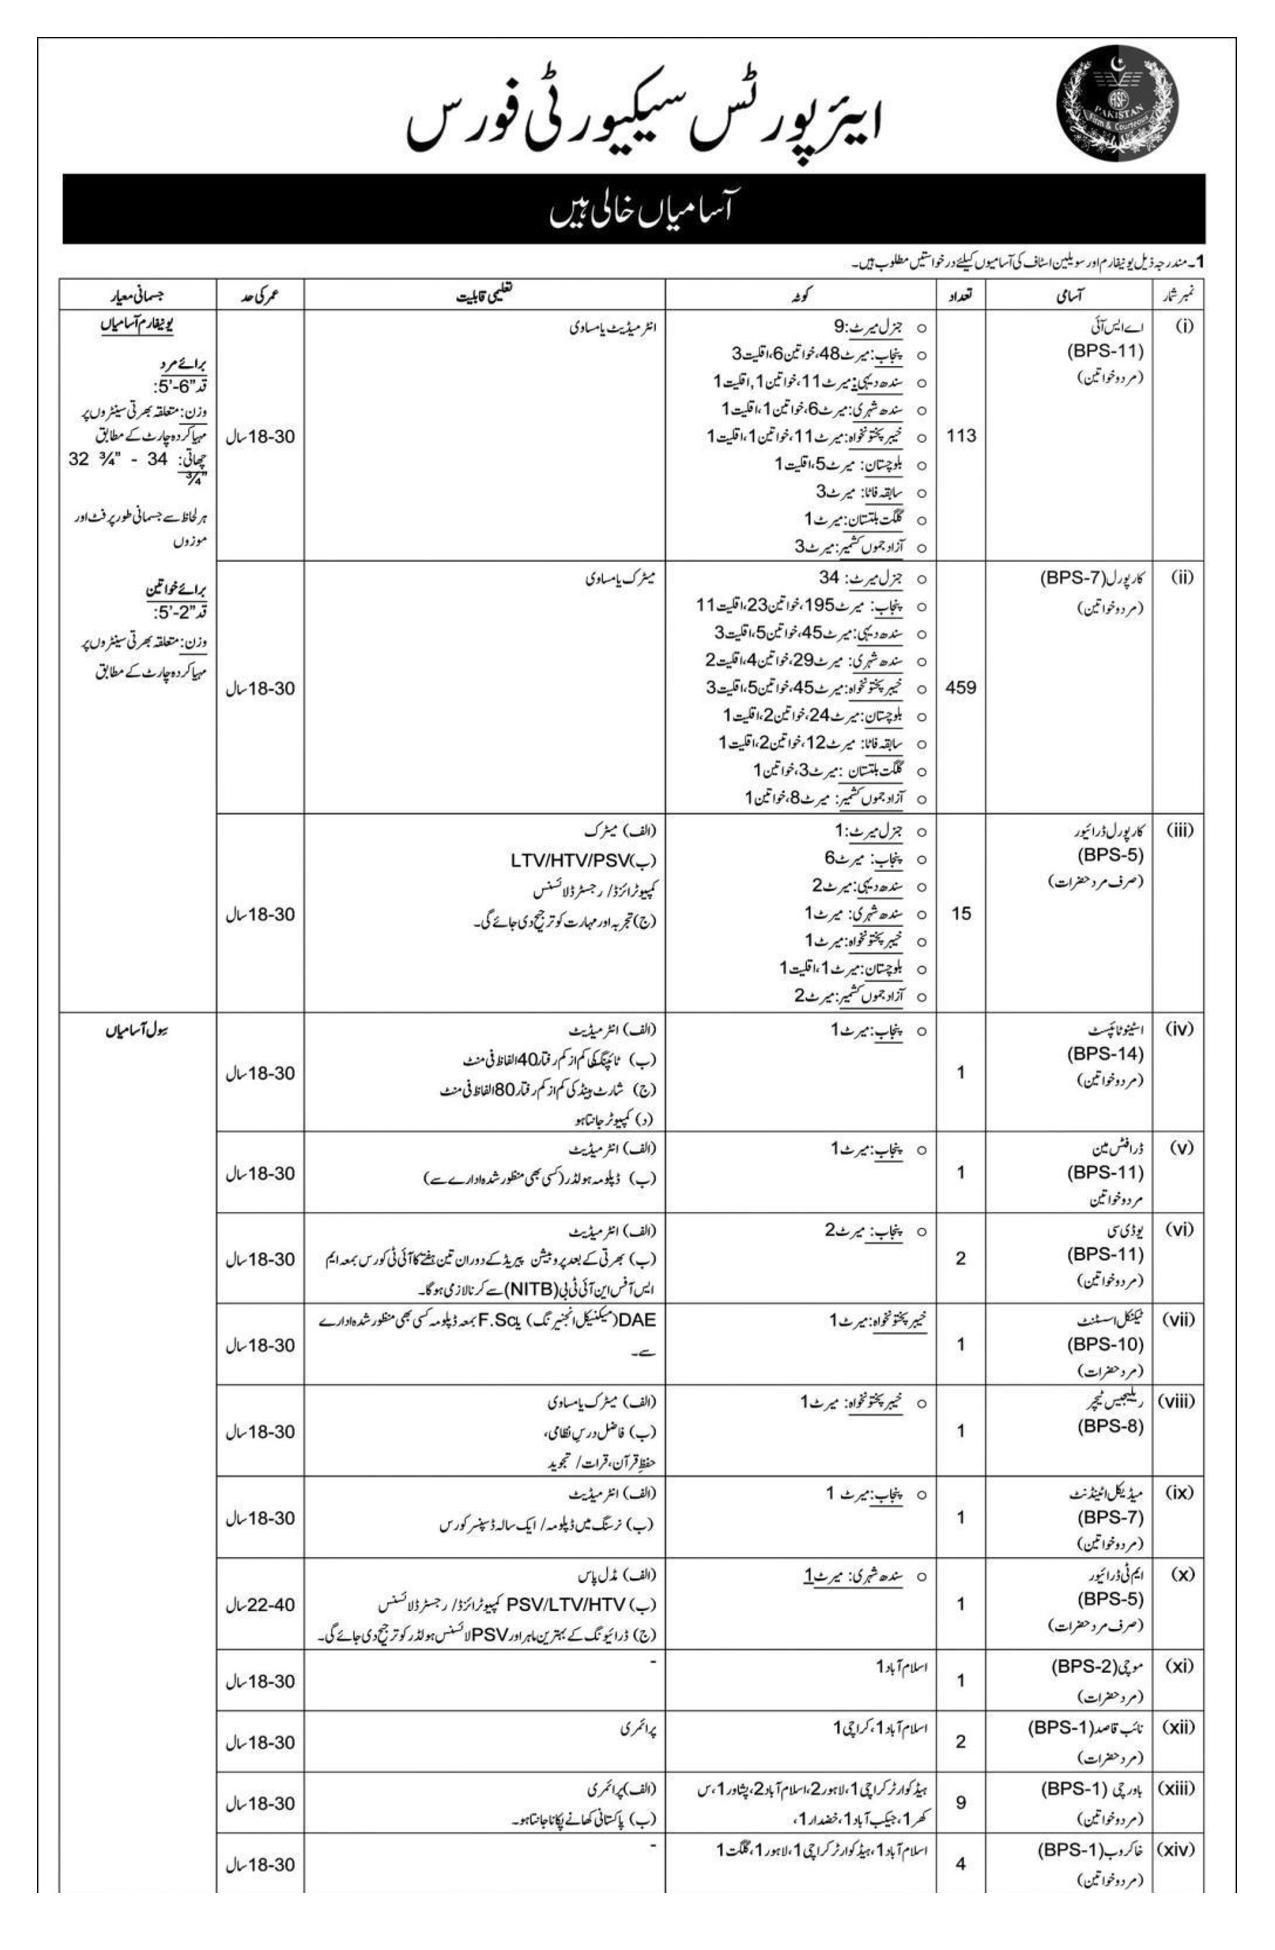 ASF Jobs 2020 Registration Form Download